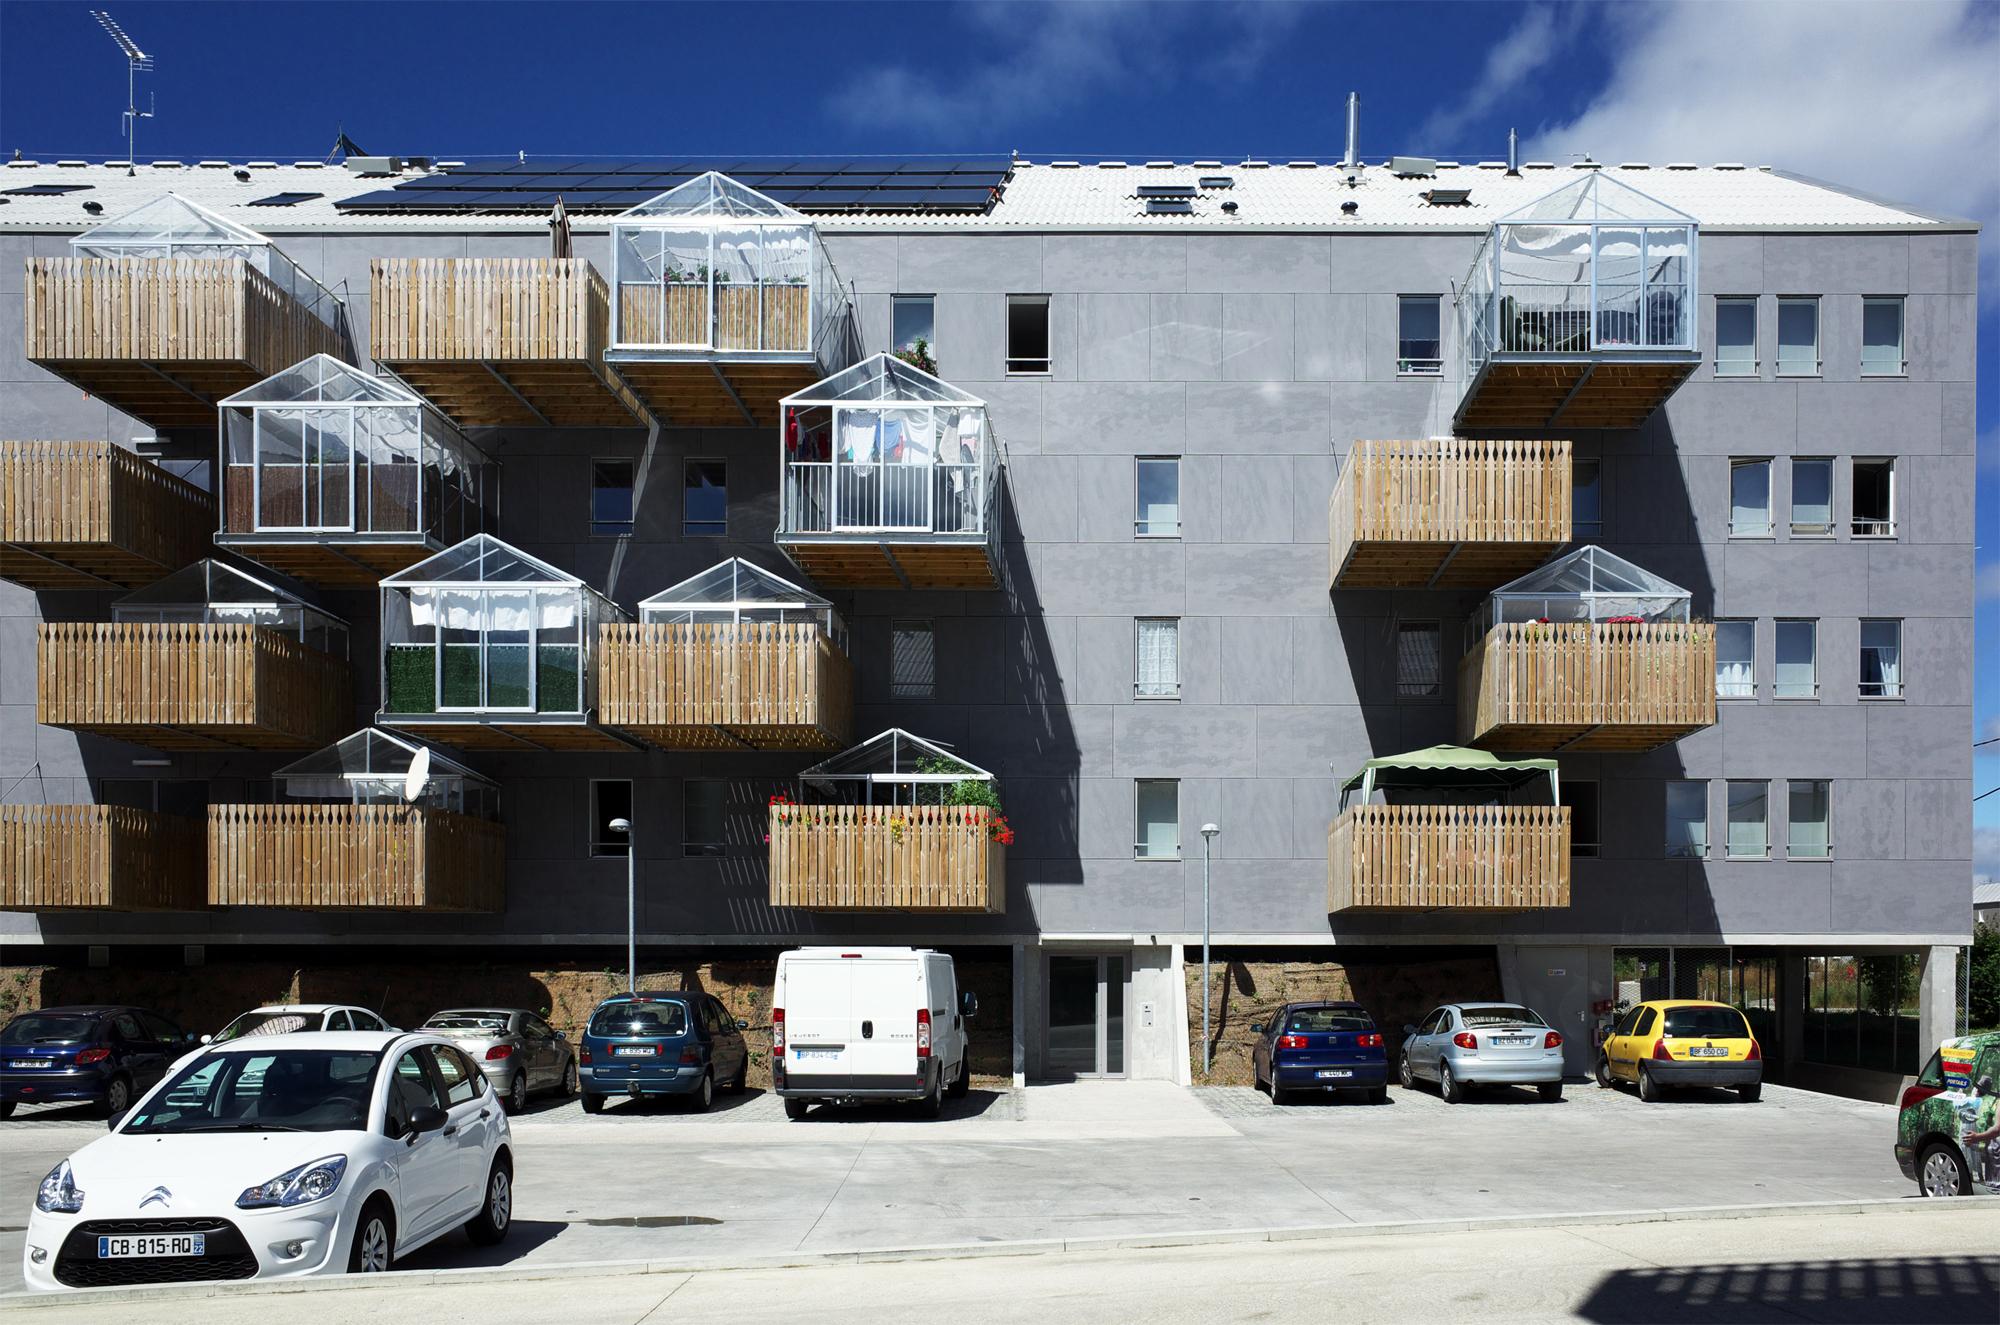 http://kienviet.net/wp-content/uploads/2013/10/522faadbe8e44e26010000e4_pradenn-housing-block-architectes_r0000193.jpg